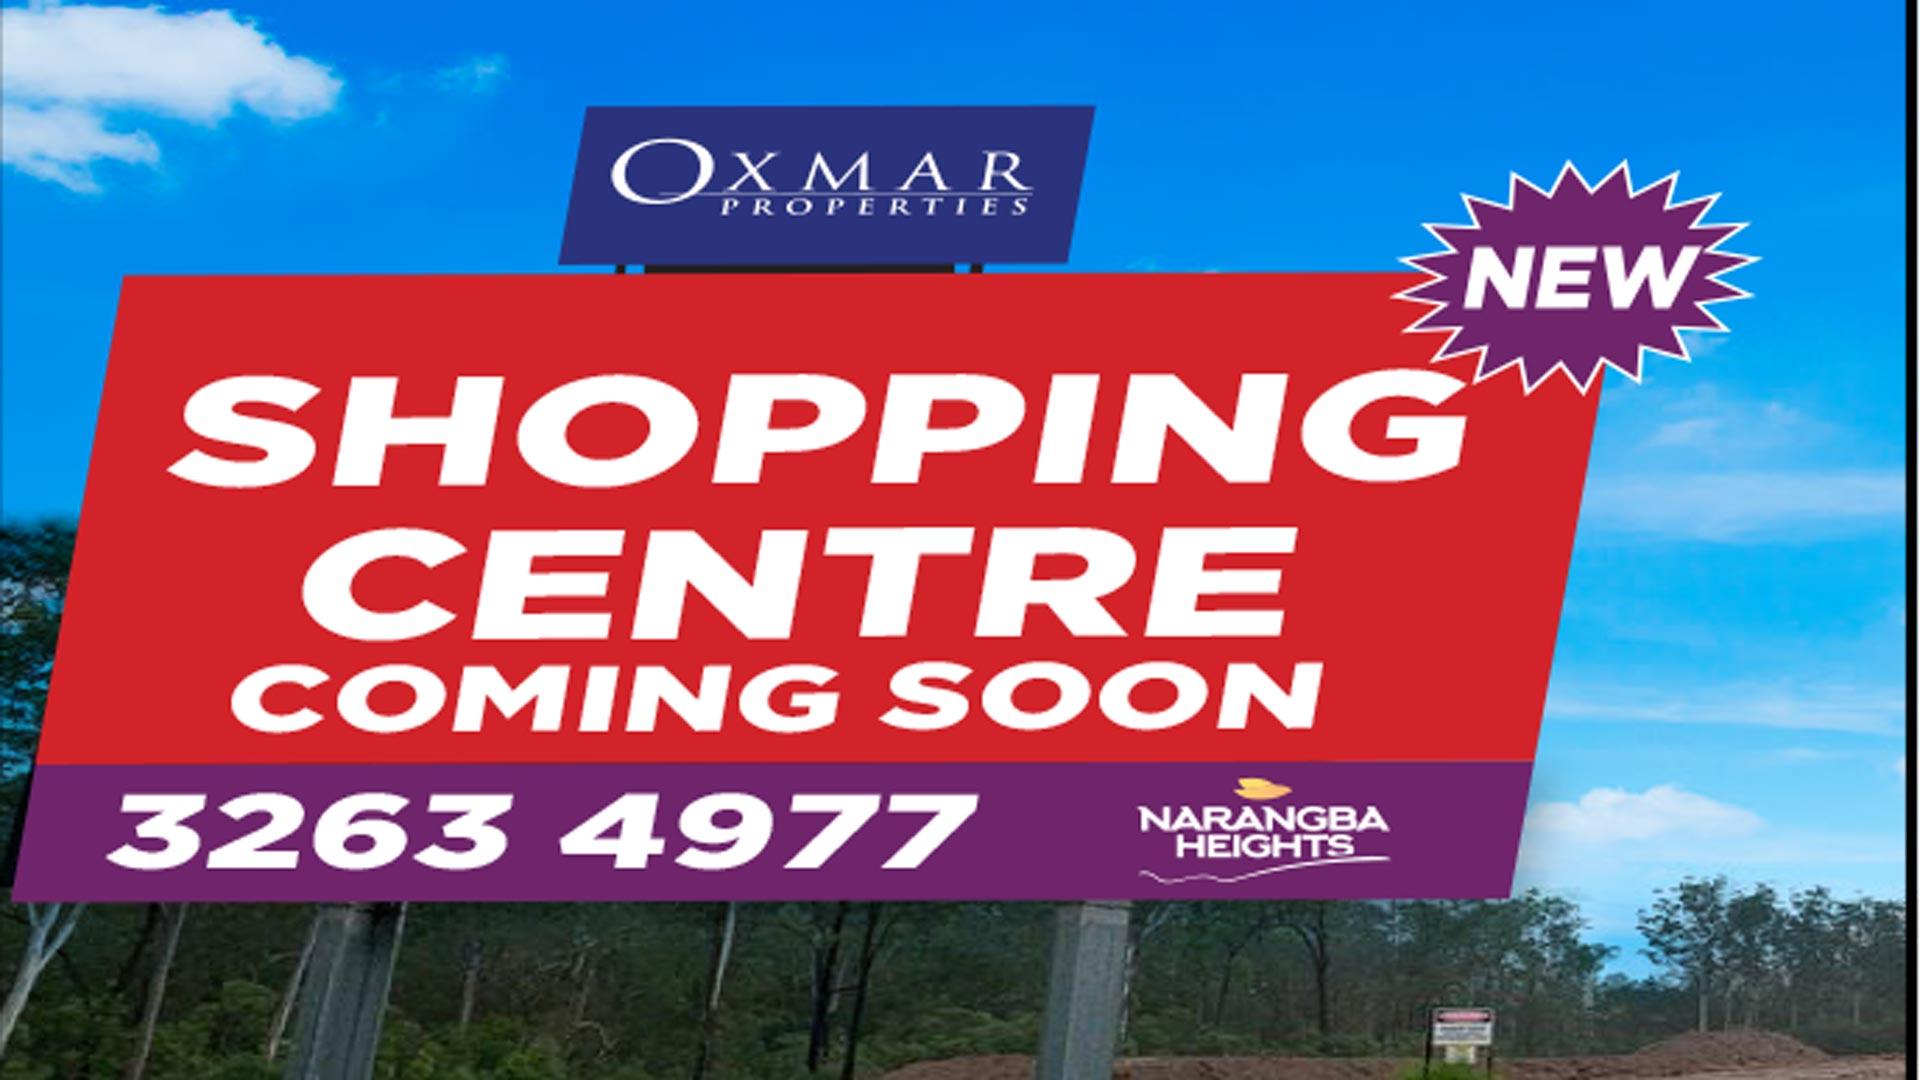 Narangba Heights Shopping centre update